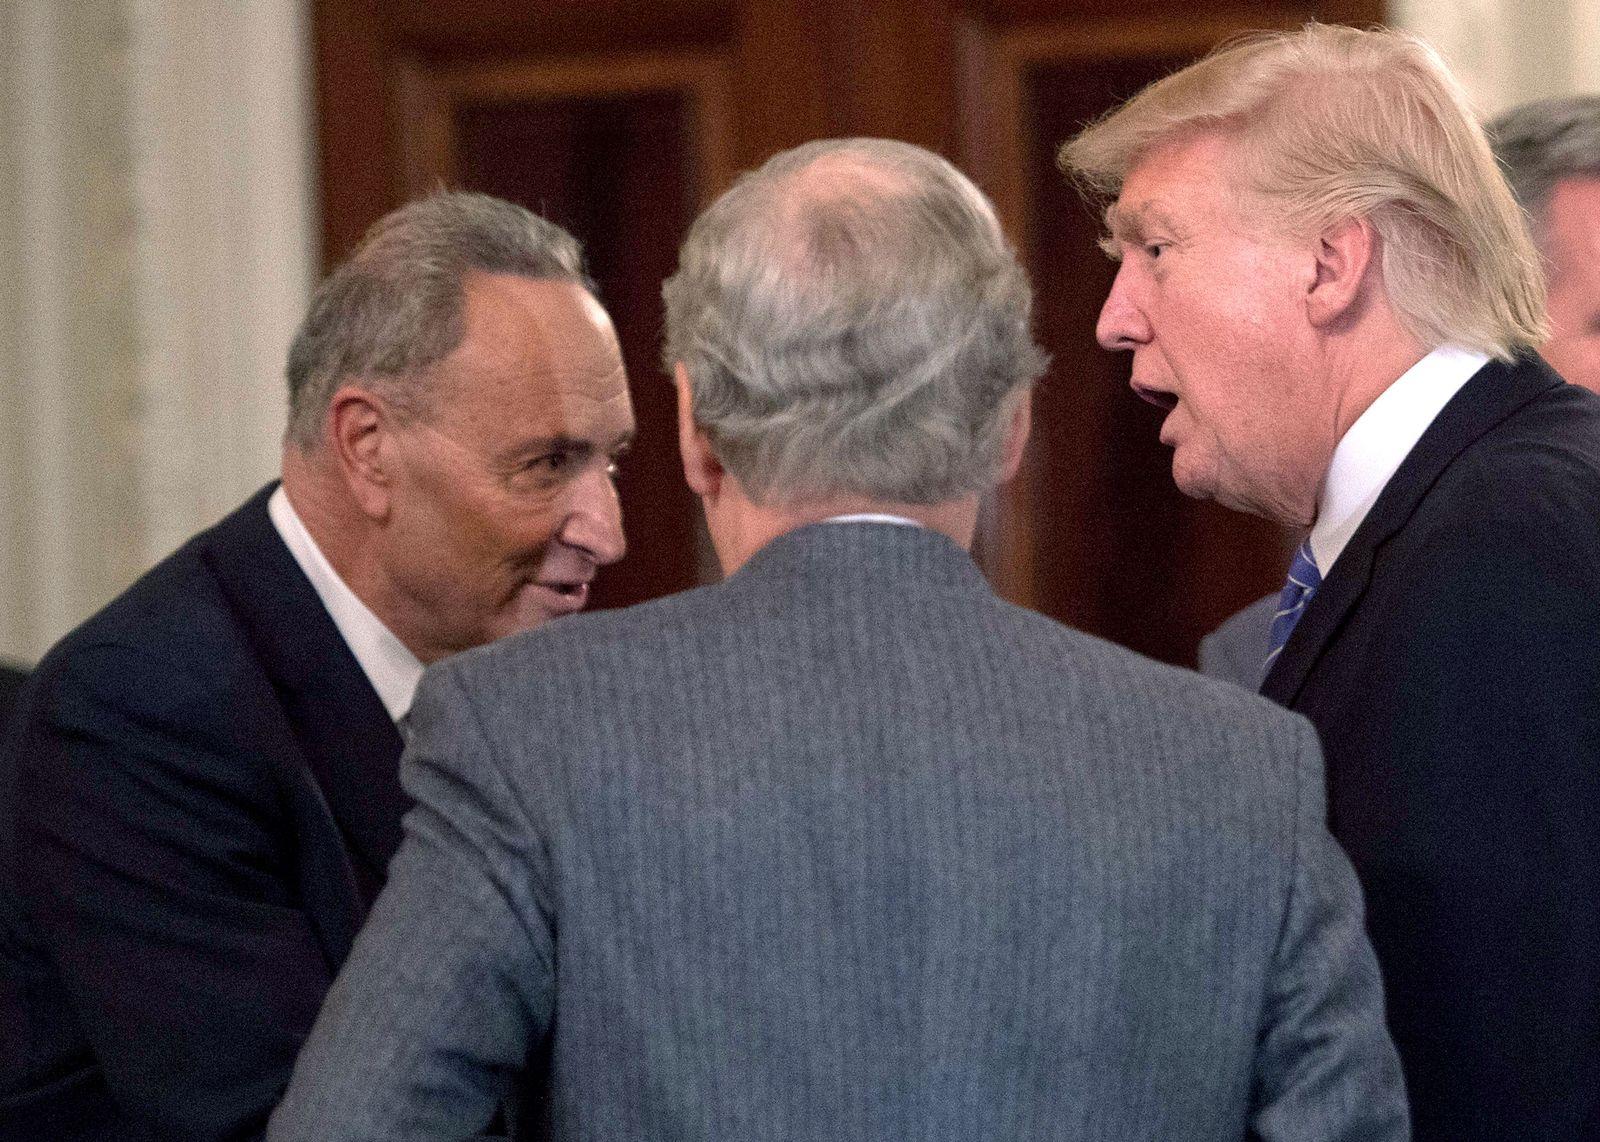 Chuck Schumer/Donald Trump